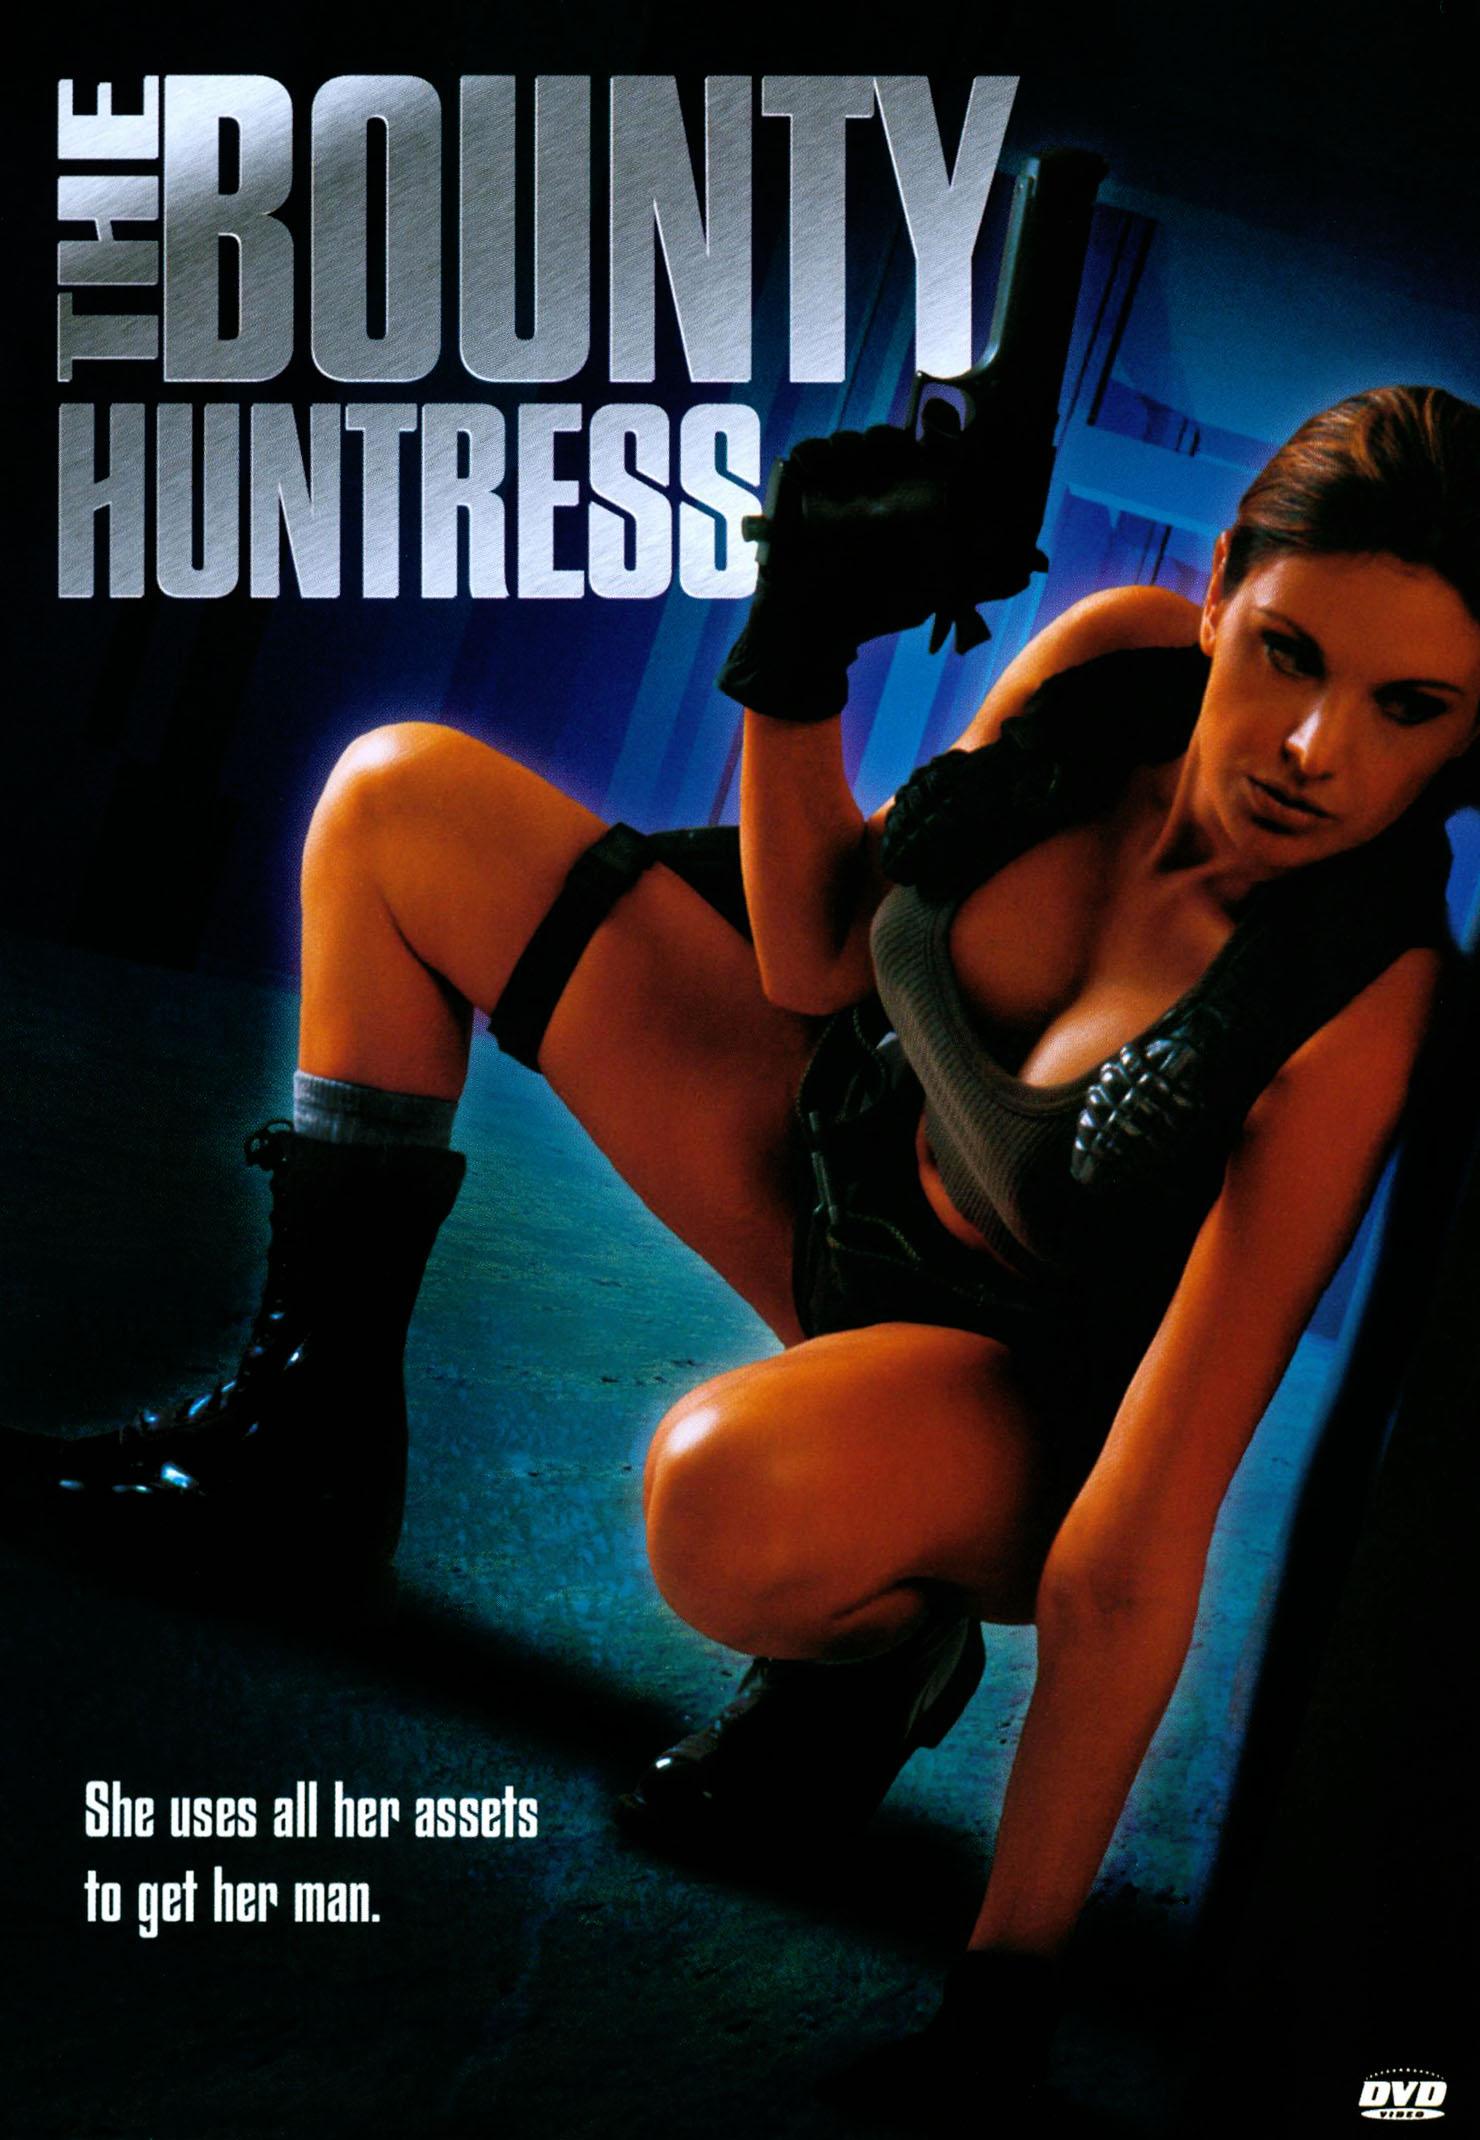 The Bounty Huntress